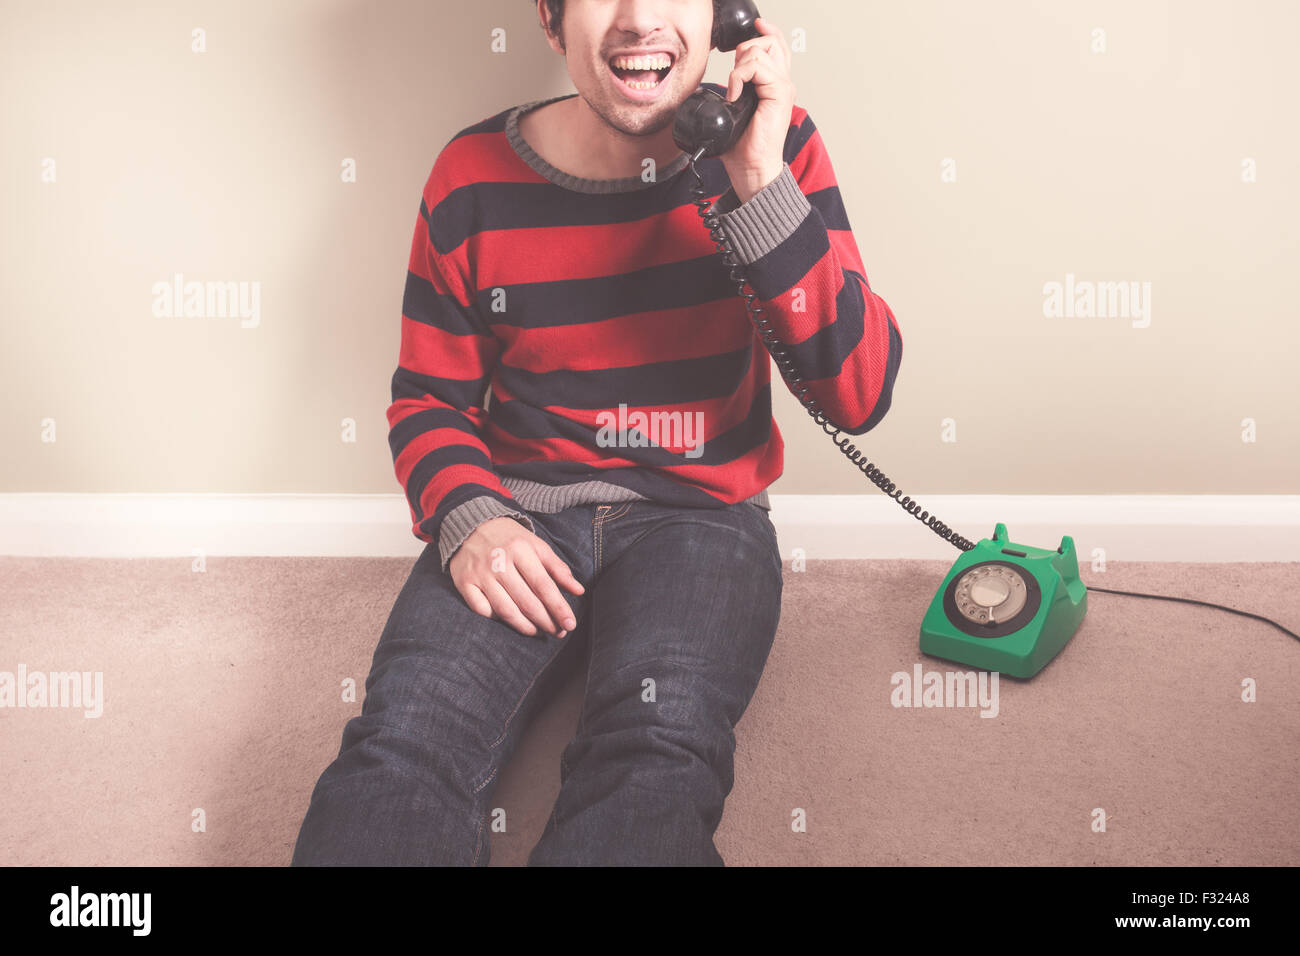 Feliz joven habla por teléfono Imagen De Stock